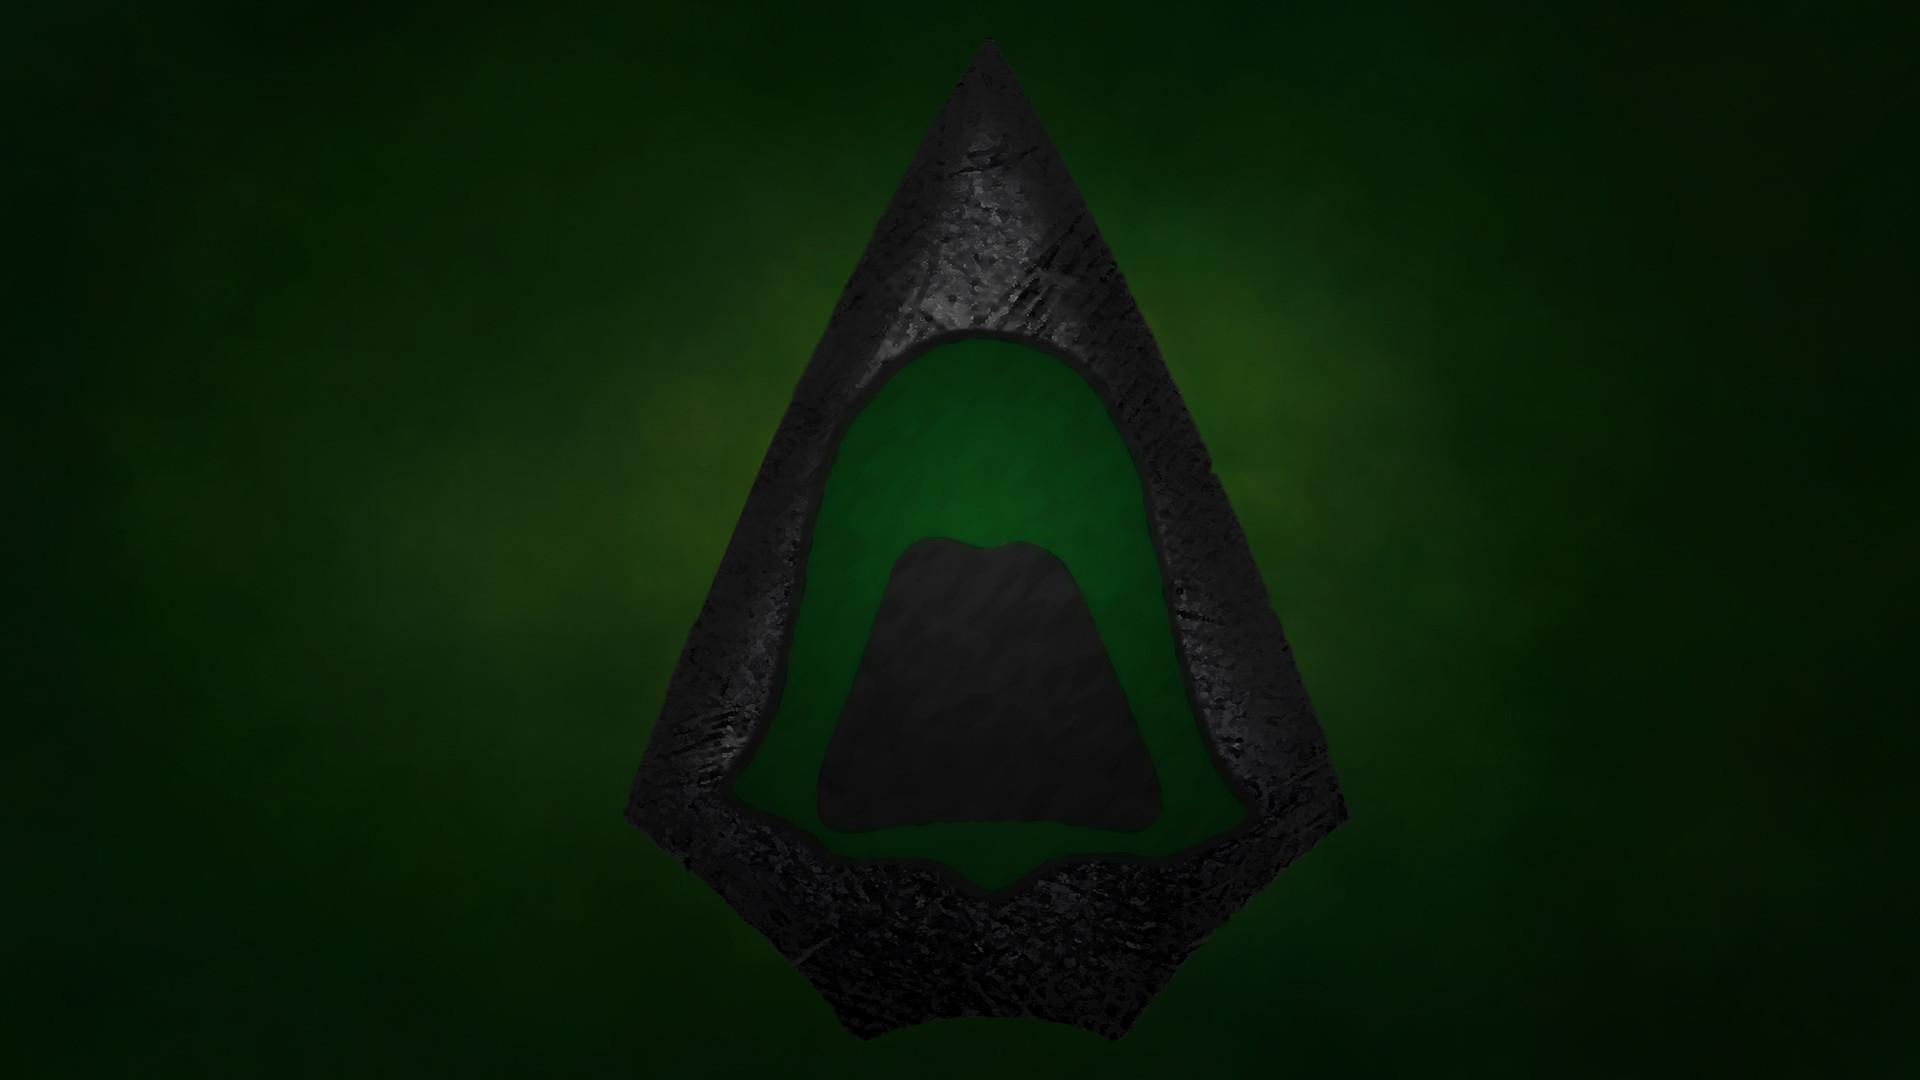 Green Arrow Wallpaper – WallpaperSafari